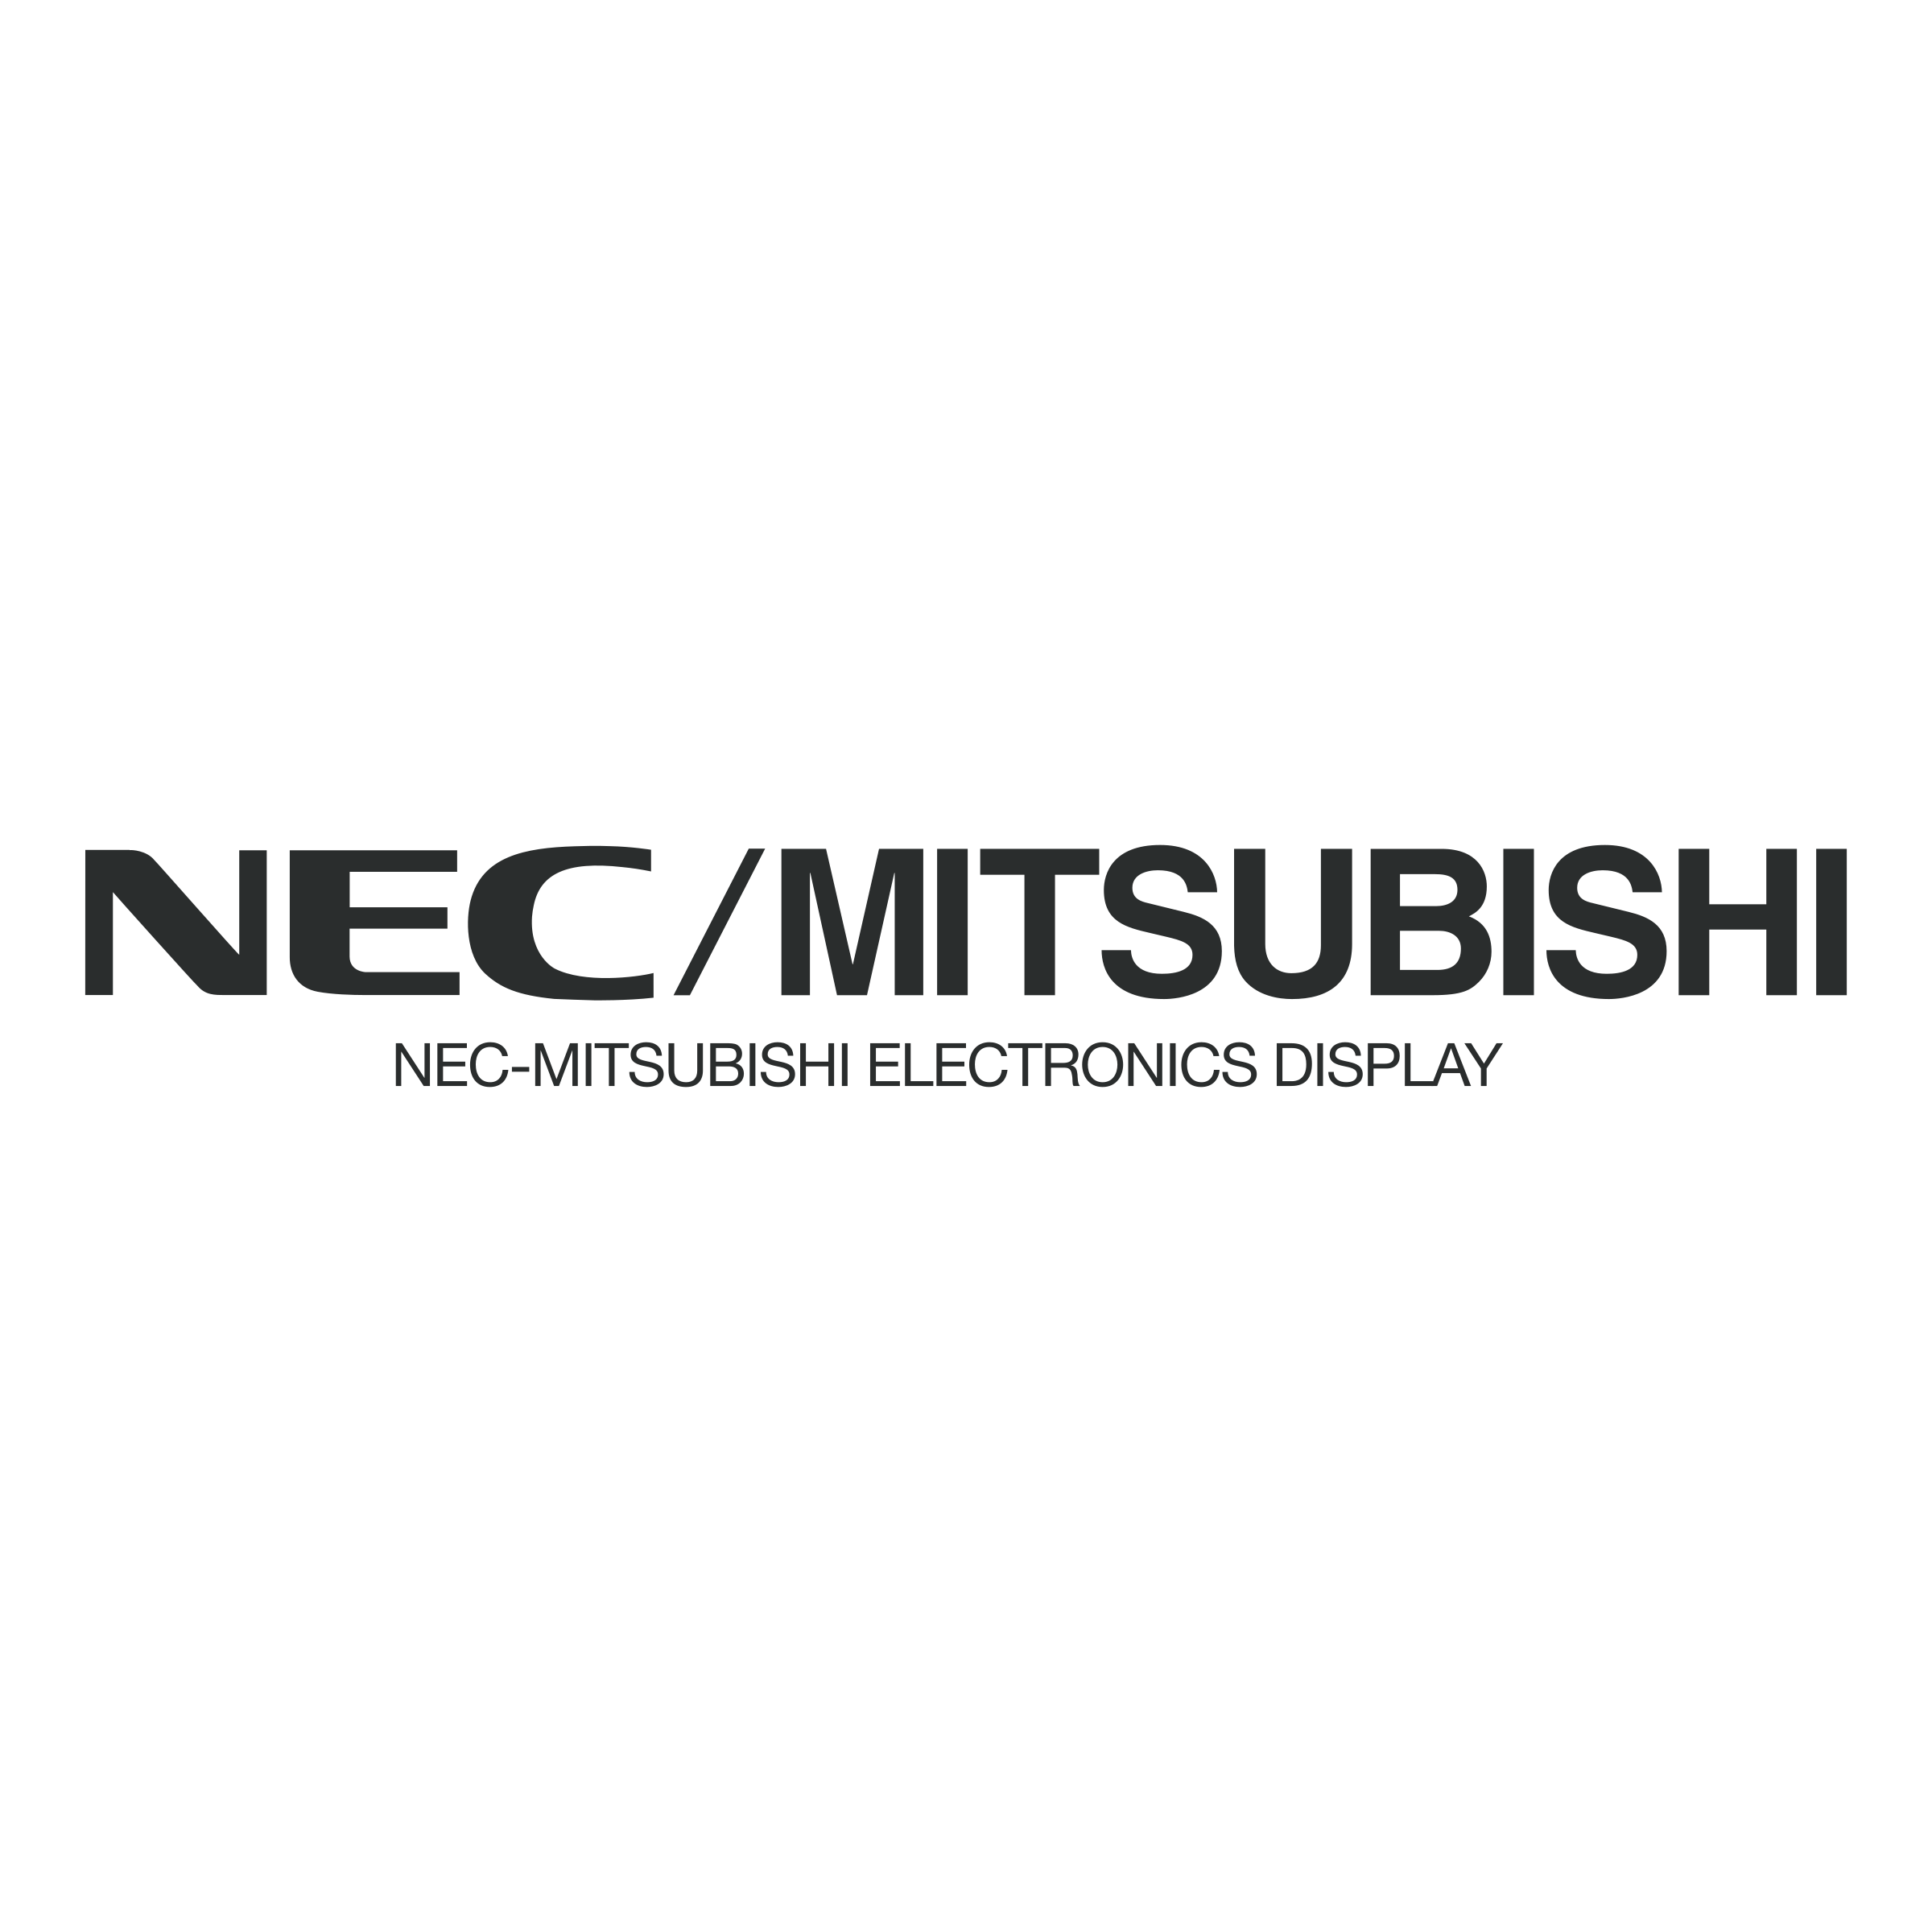 NEC Mitsubishi Logo PNG Transparent & SVG Vector - Freebie Supply